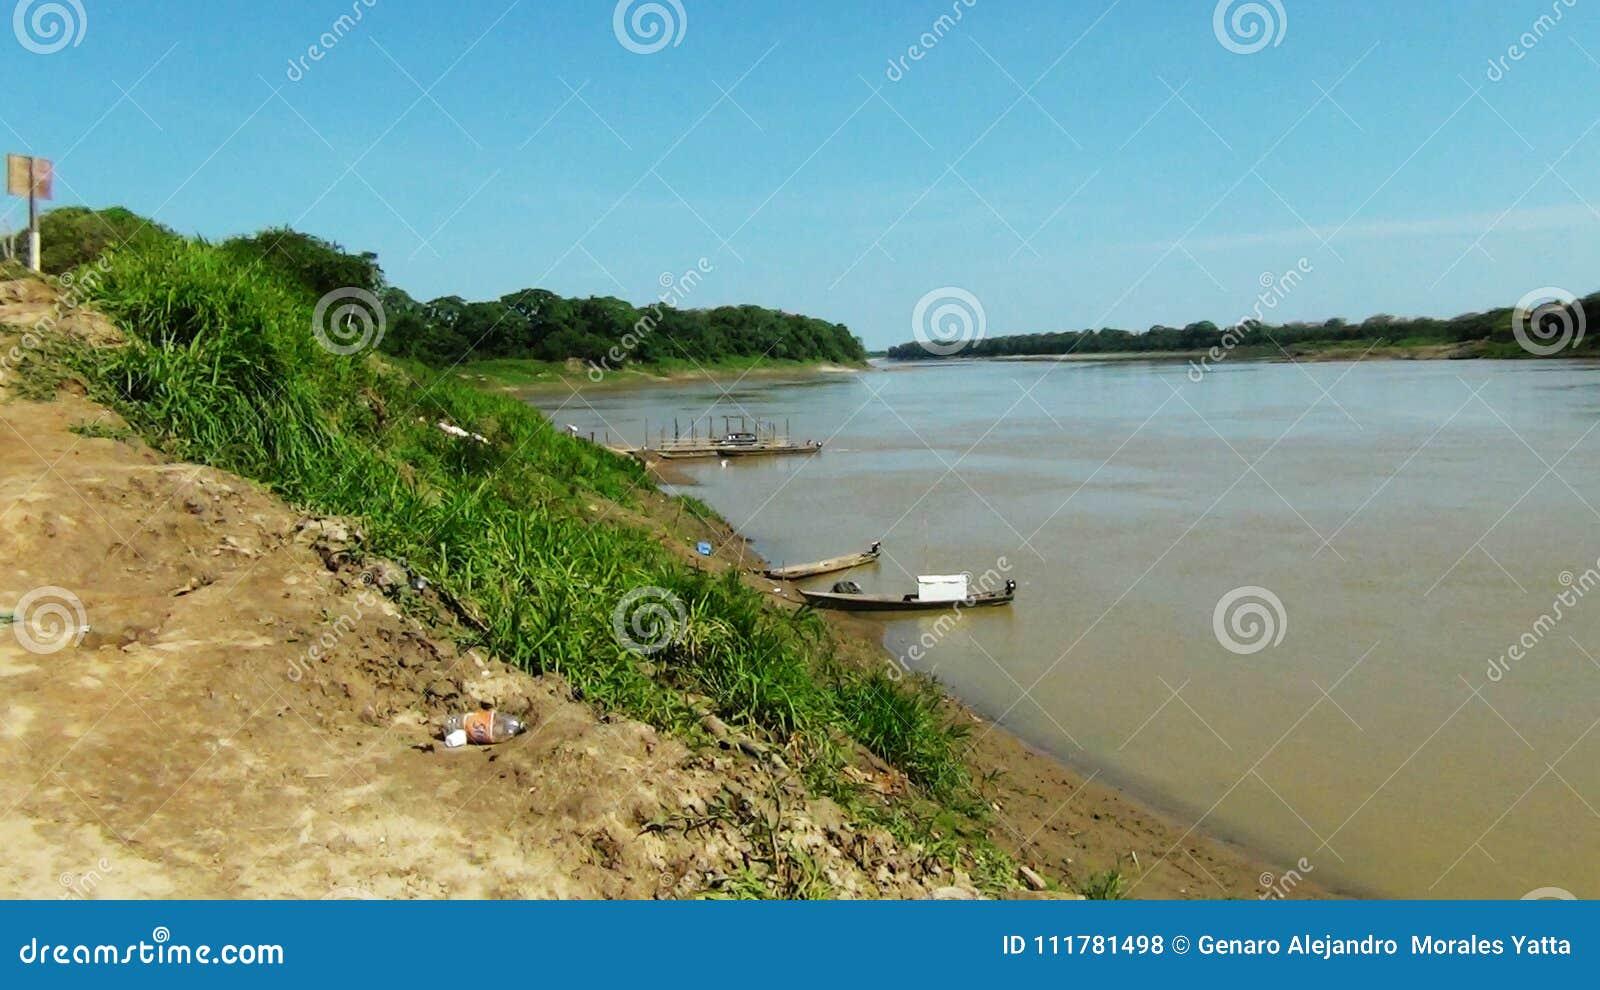 Amazonriverboat